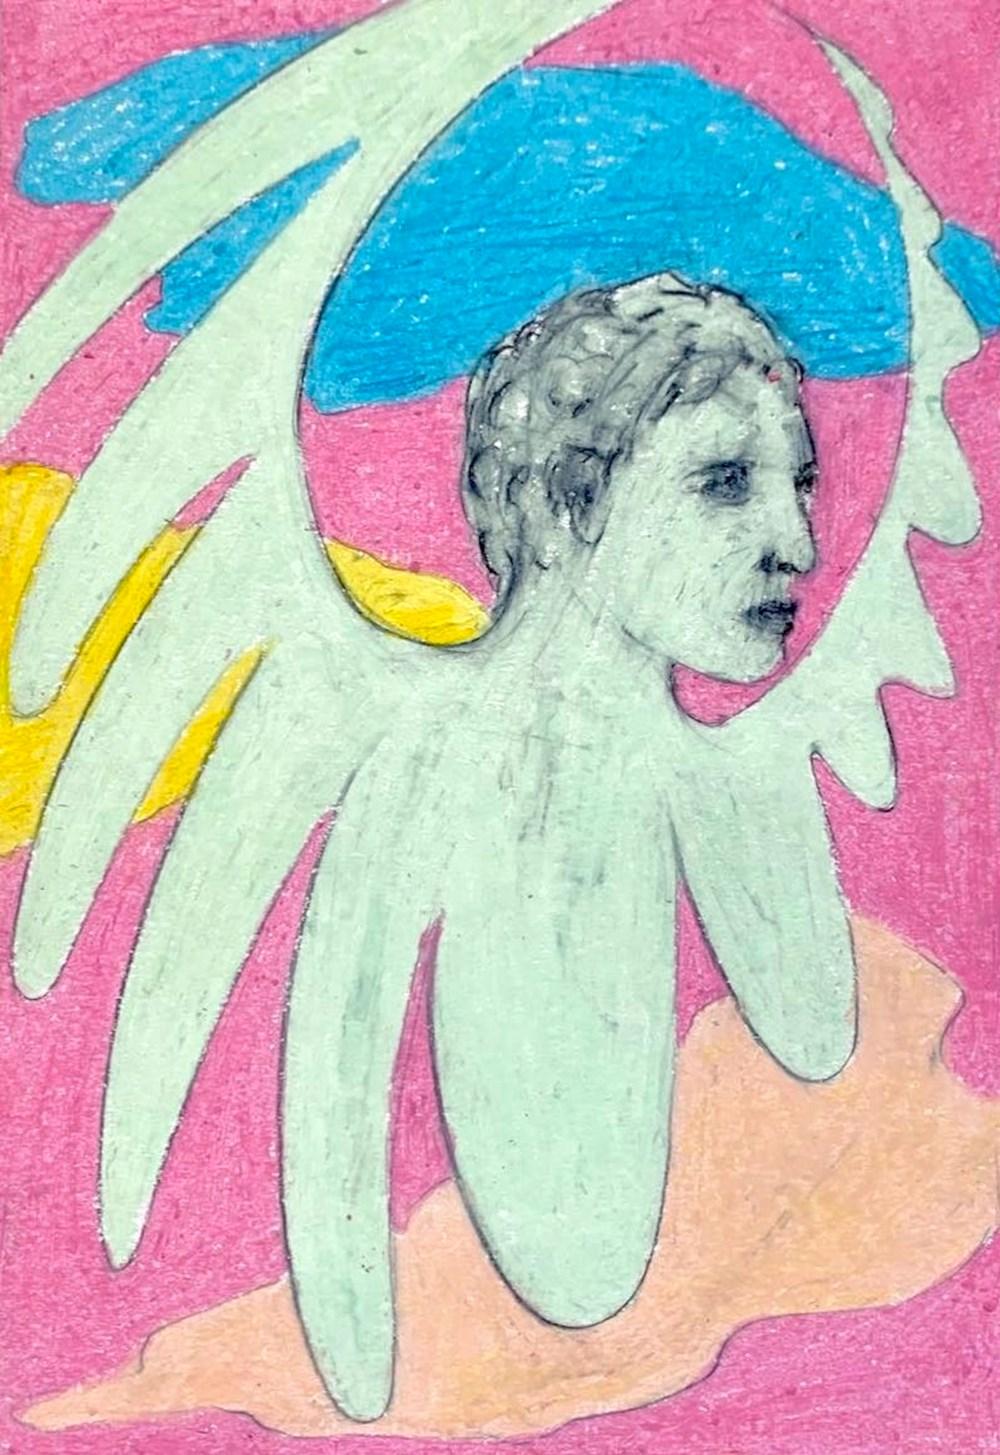 Life on Venus II | The Human, Live Auction - Lot 1, Rebecca Sammon, Soaring Through the Sky